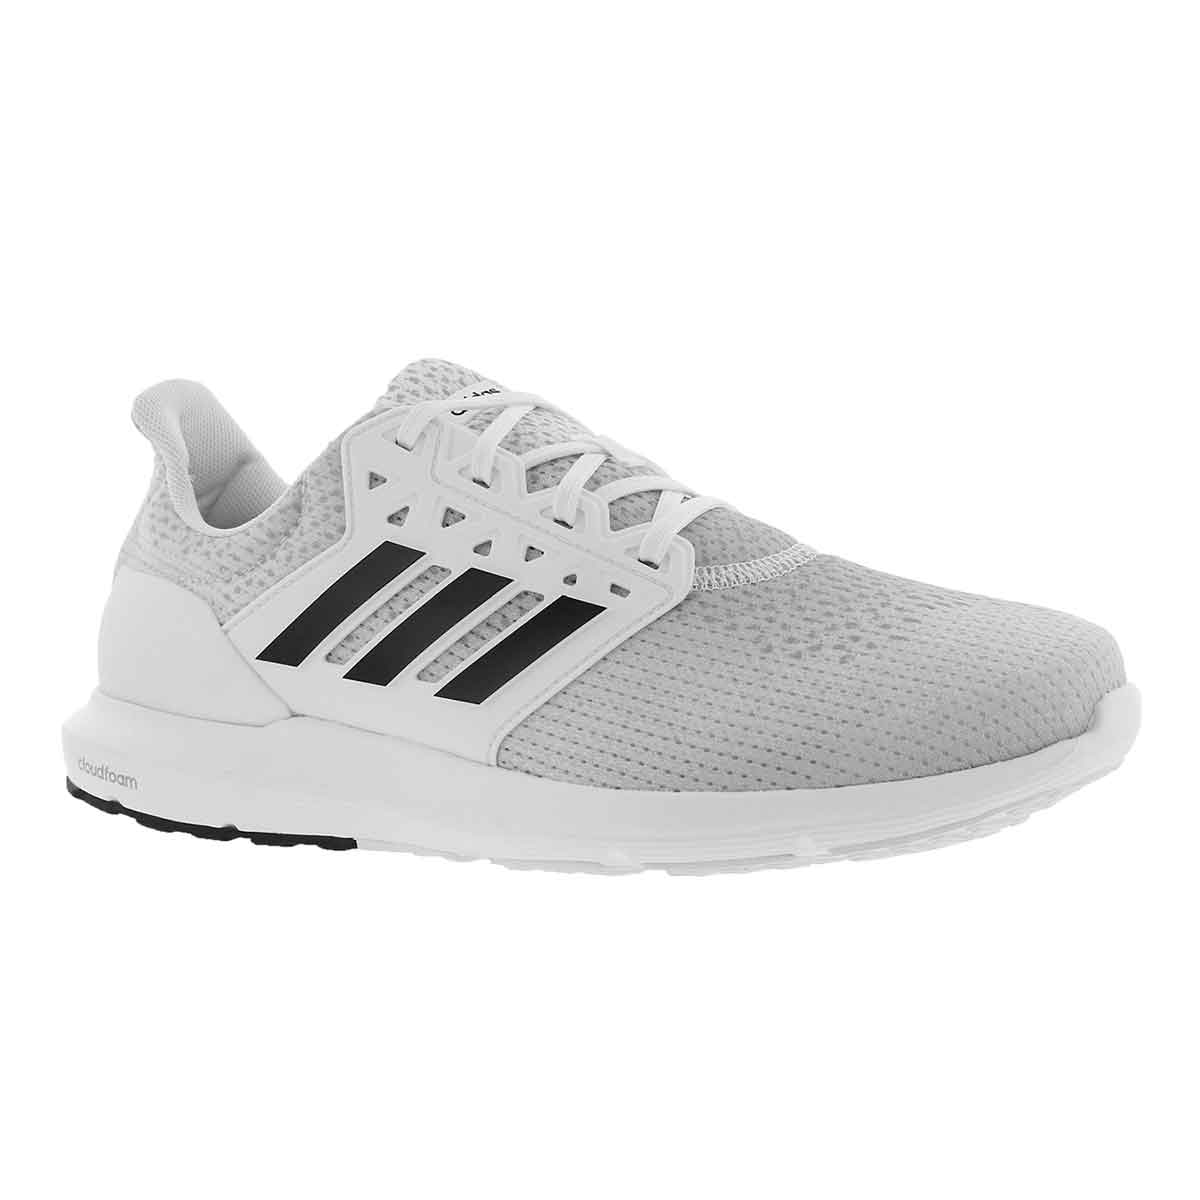 Men's SOLYX white/black/grey running shoe